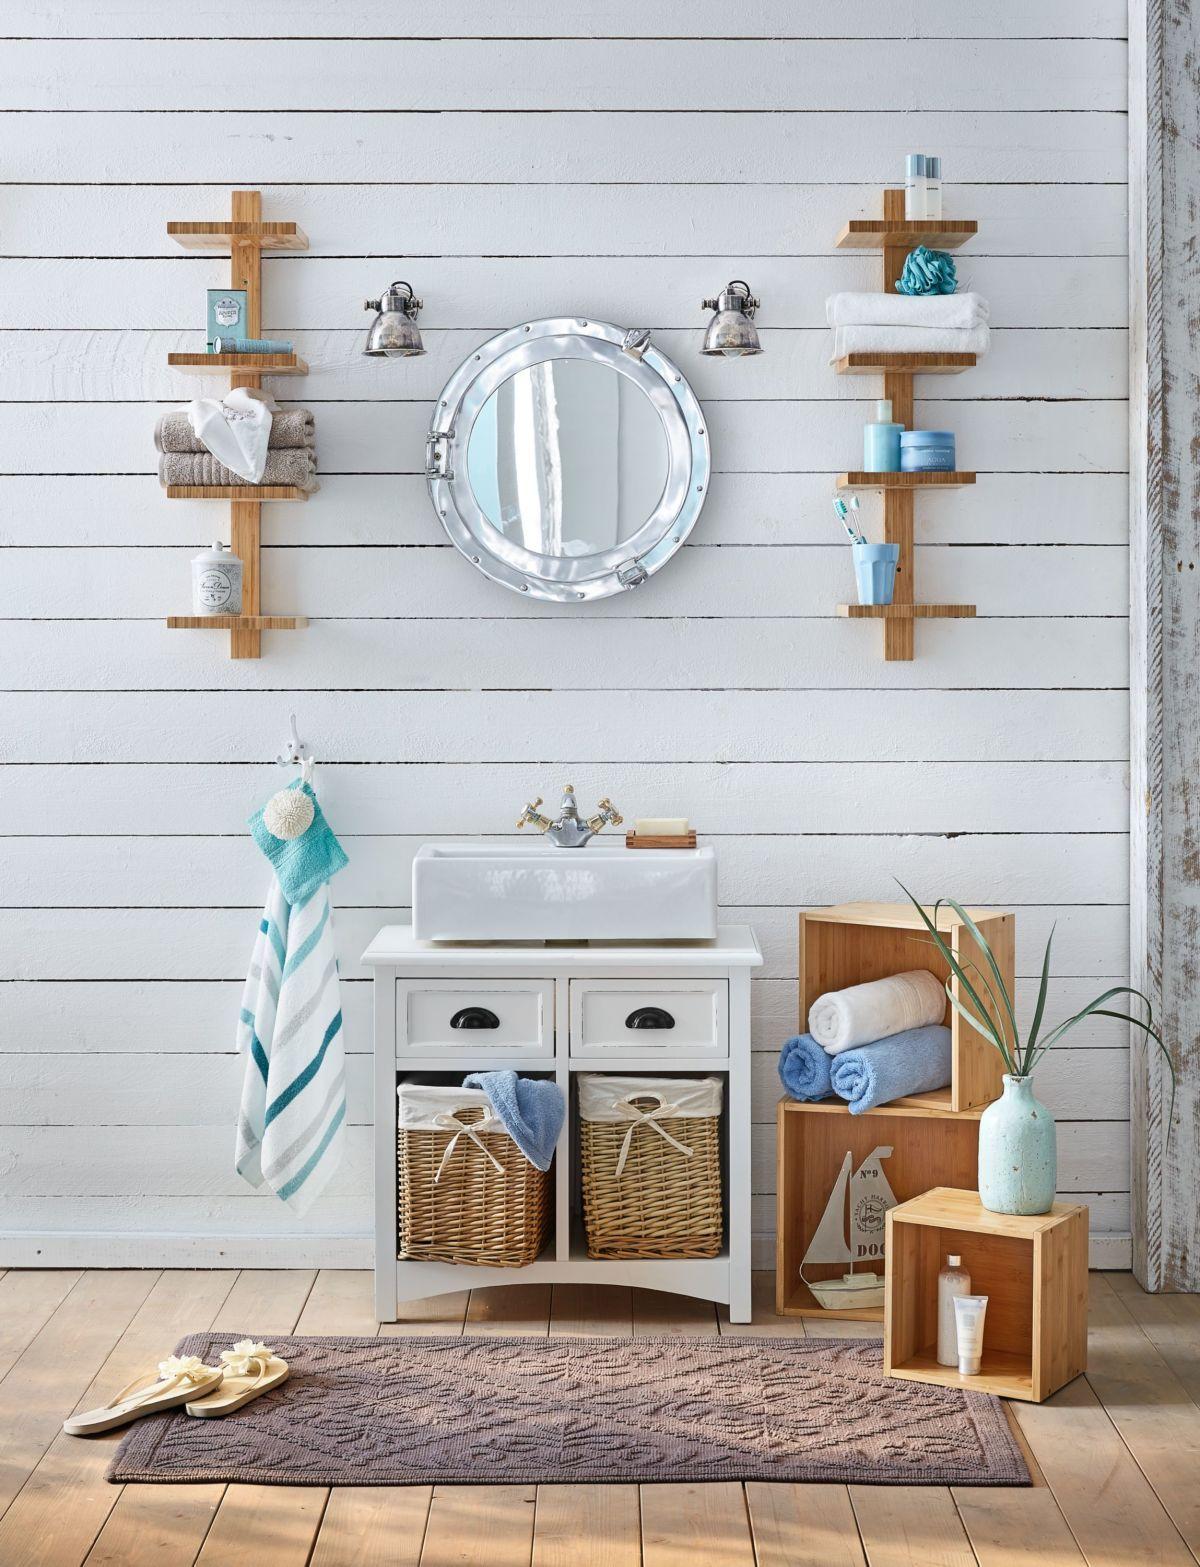 wandregal set 3 tlg bamboo natur look jetzt bestellen unter. Black Bedroom Furniture Sets. Home Design Ideas